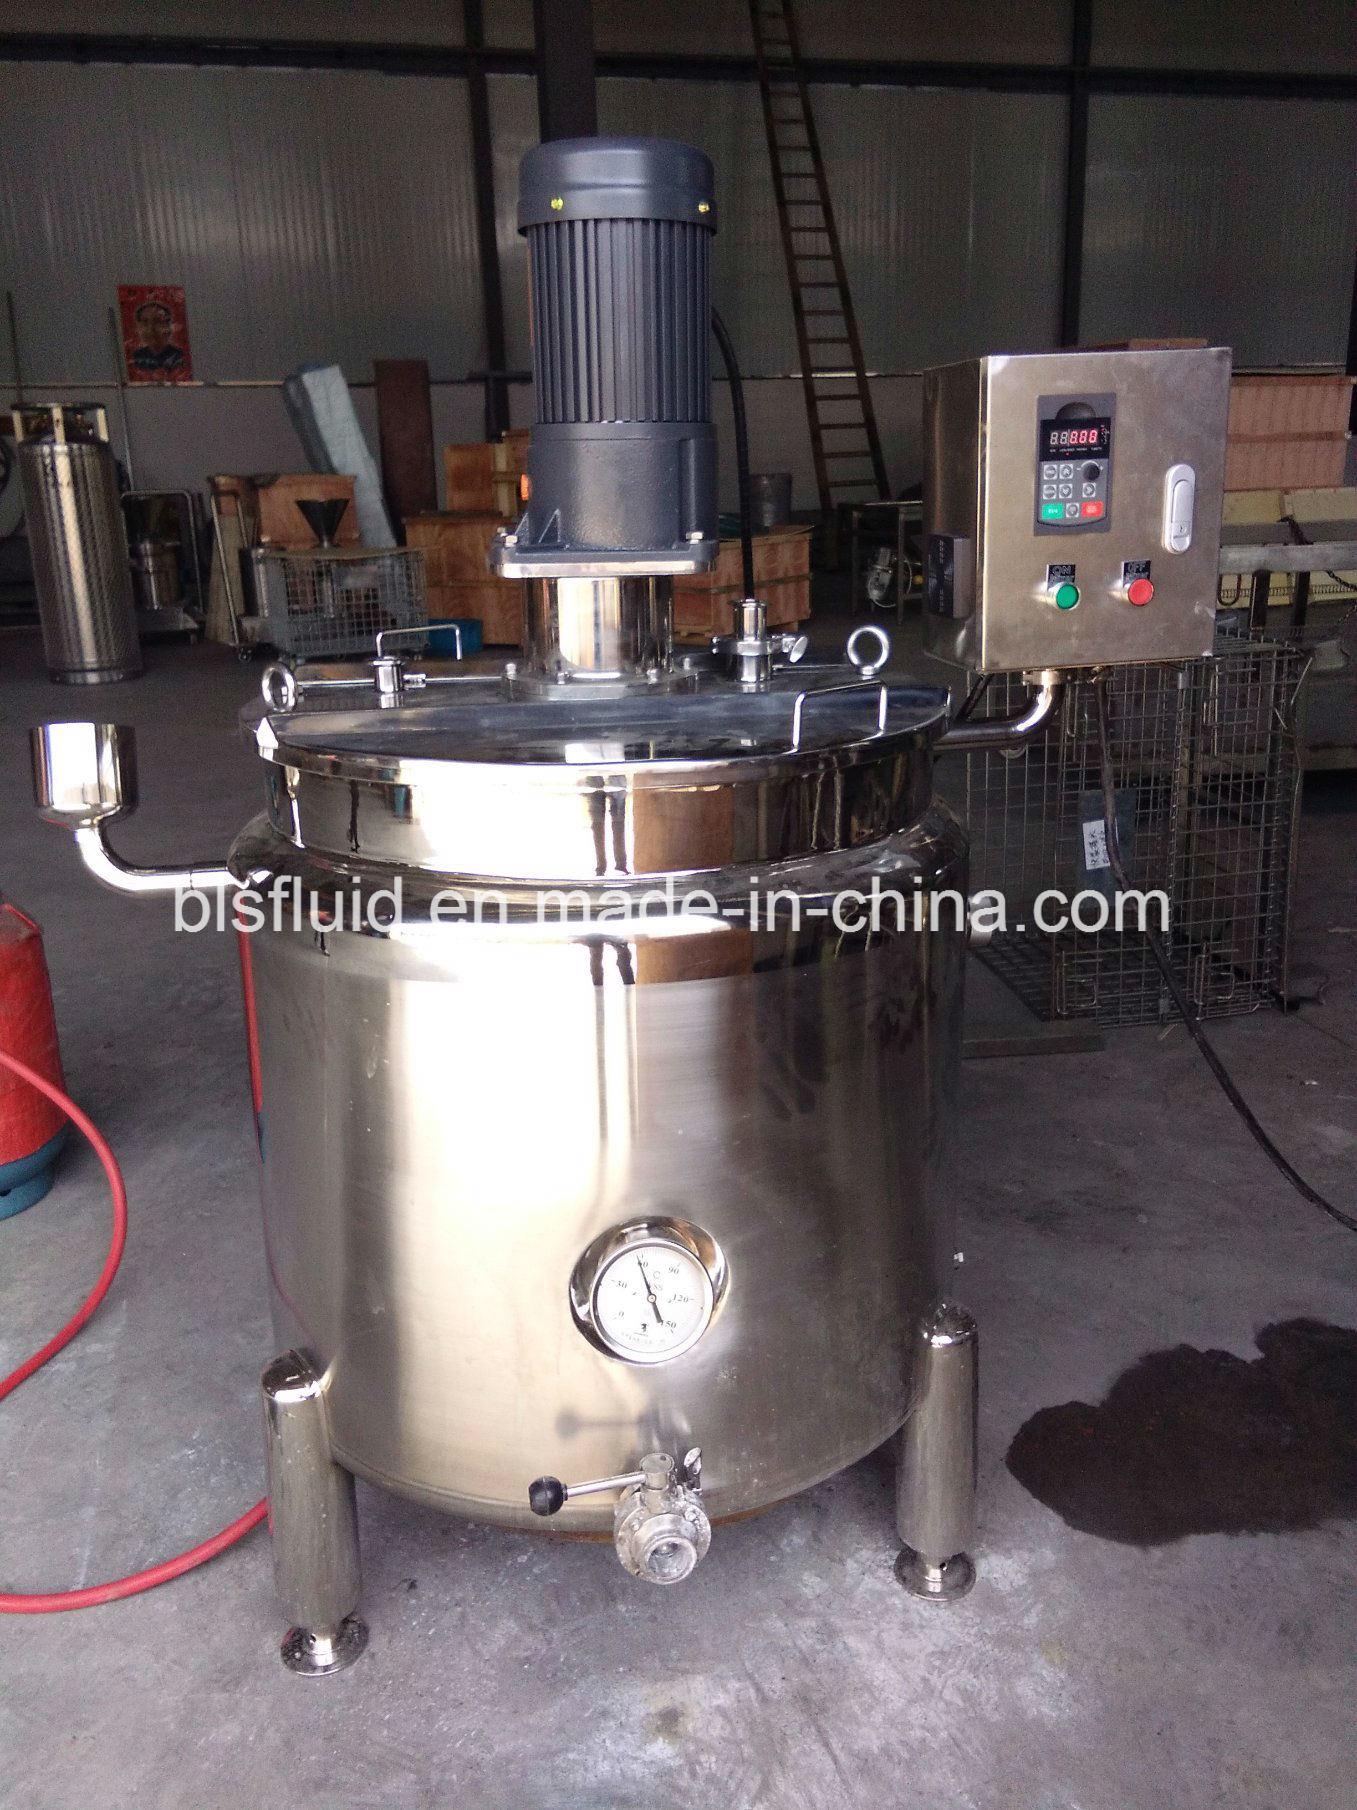 Industrial Stainless Steel 200L LPG Double Jacket Mixer Milk Boiler